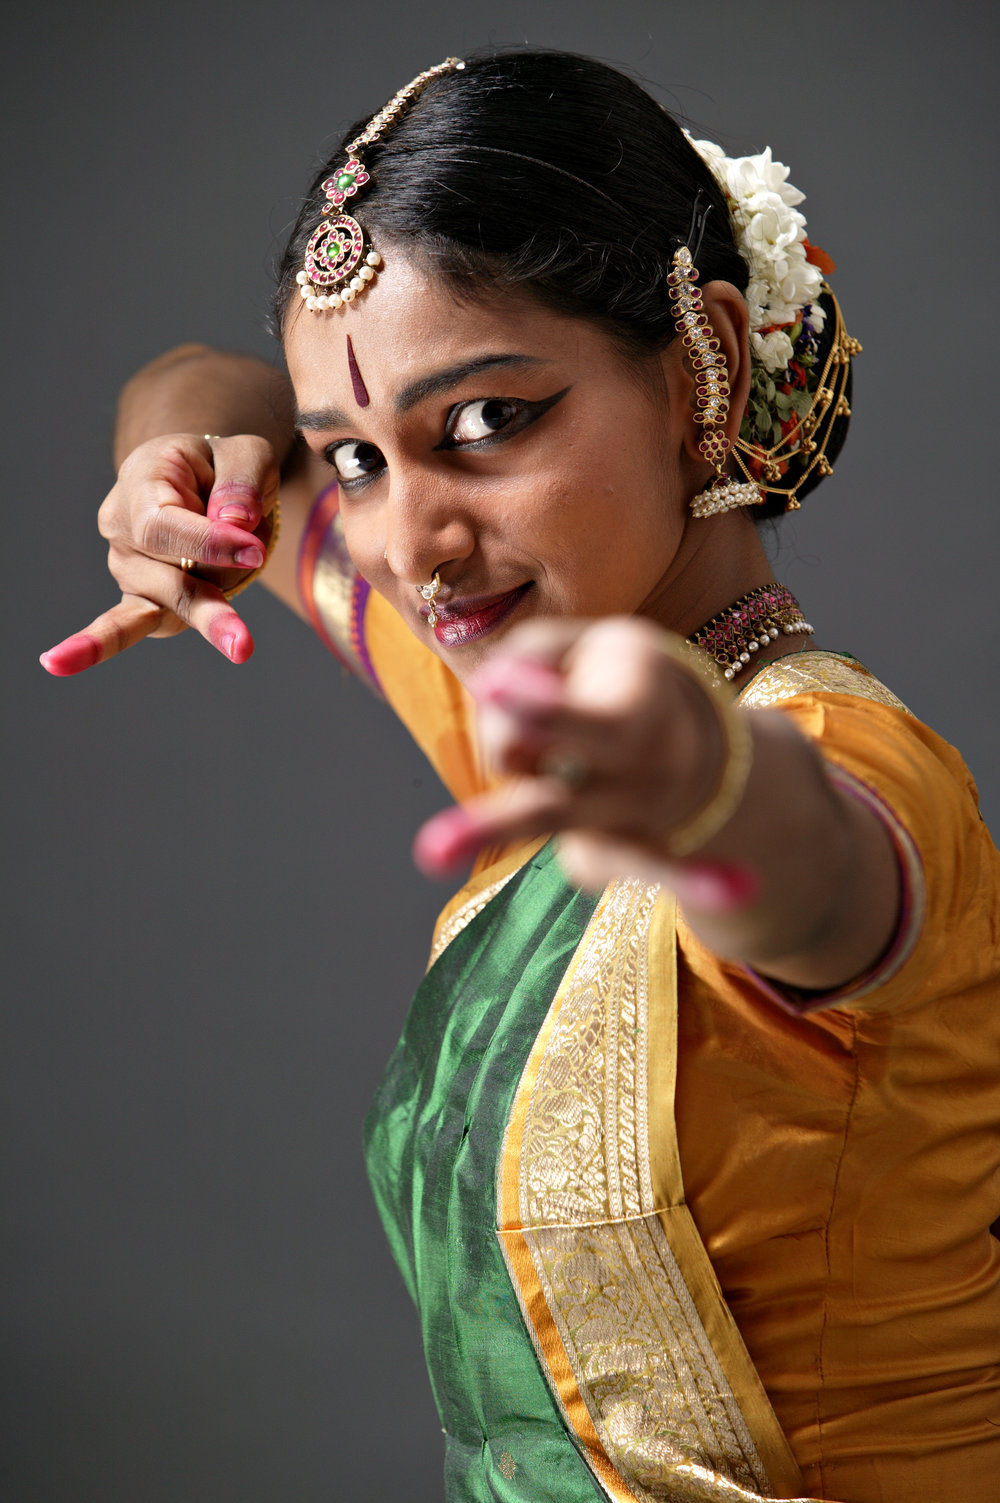 Shantala Shivalingapa_general_photo by C.P. Satyajit_6.jpg